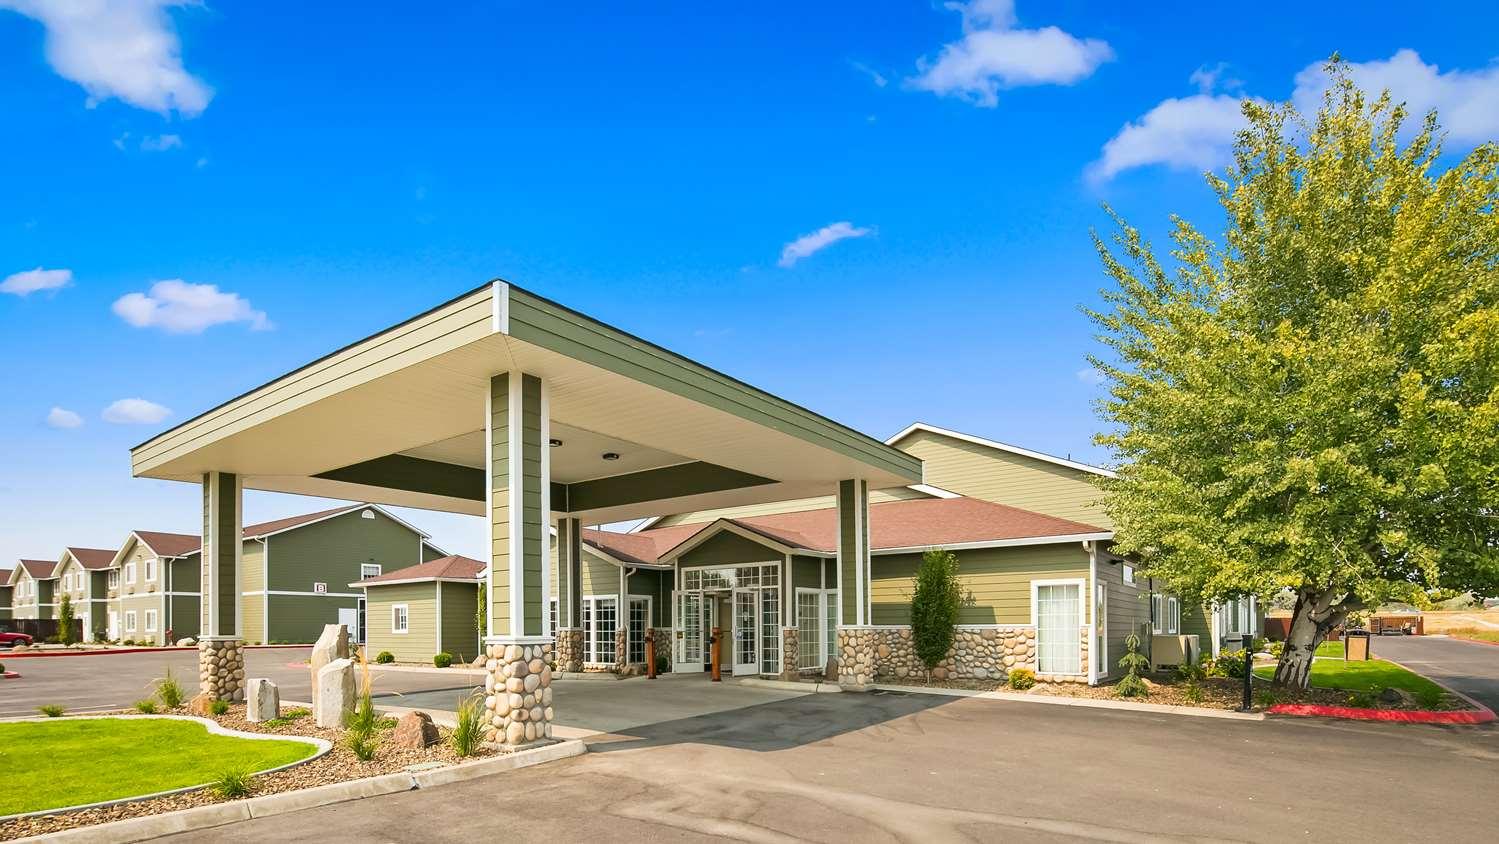 Prosser Hotels Best Western Plus The Inn At Horse Heaven In